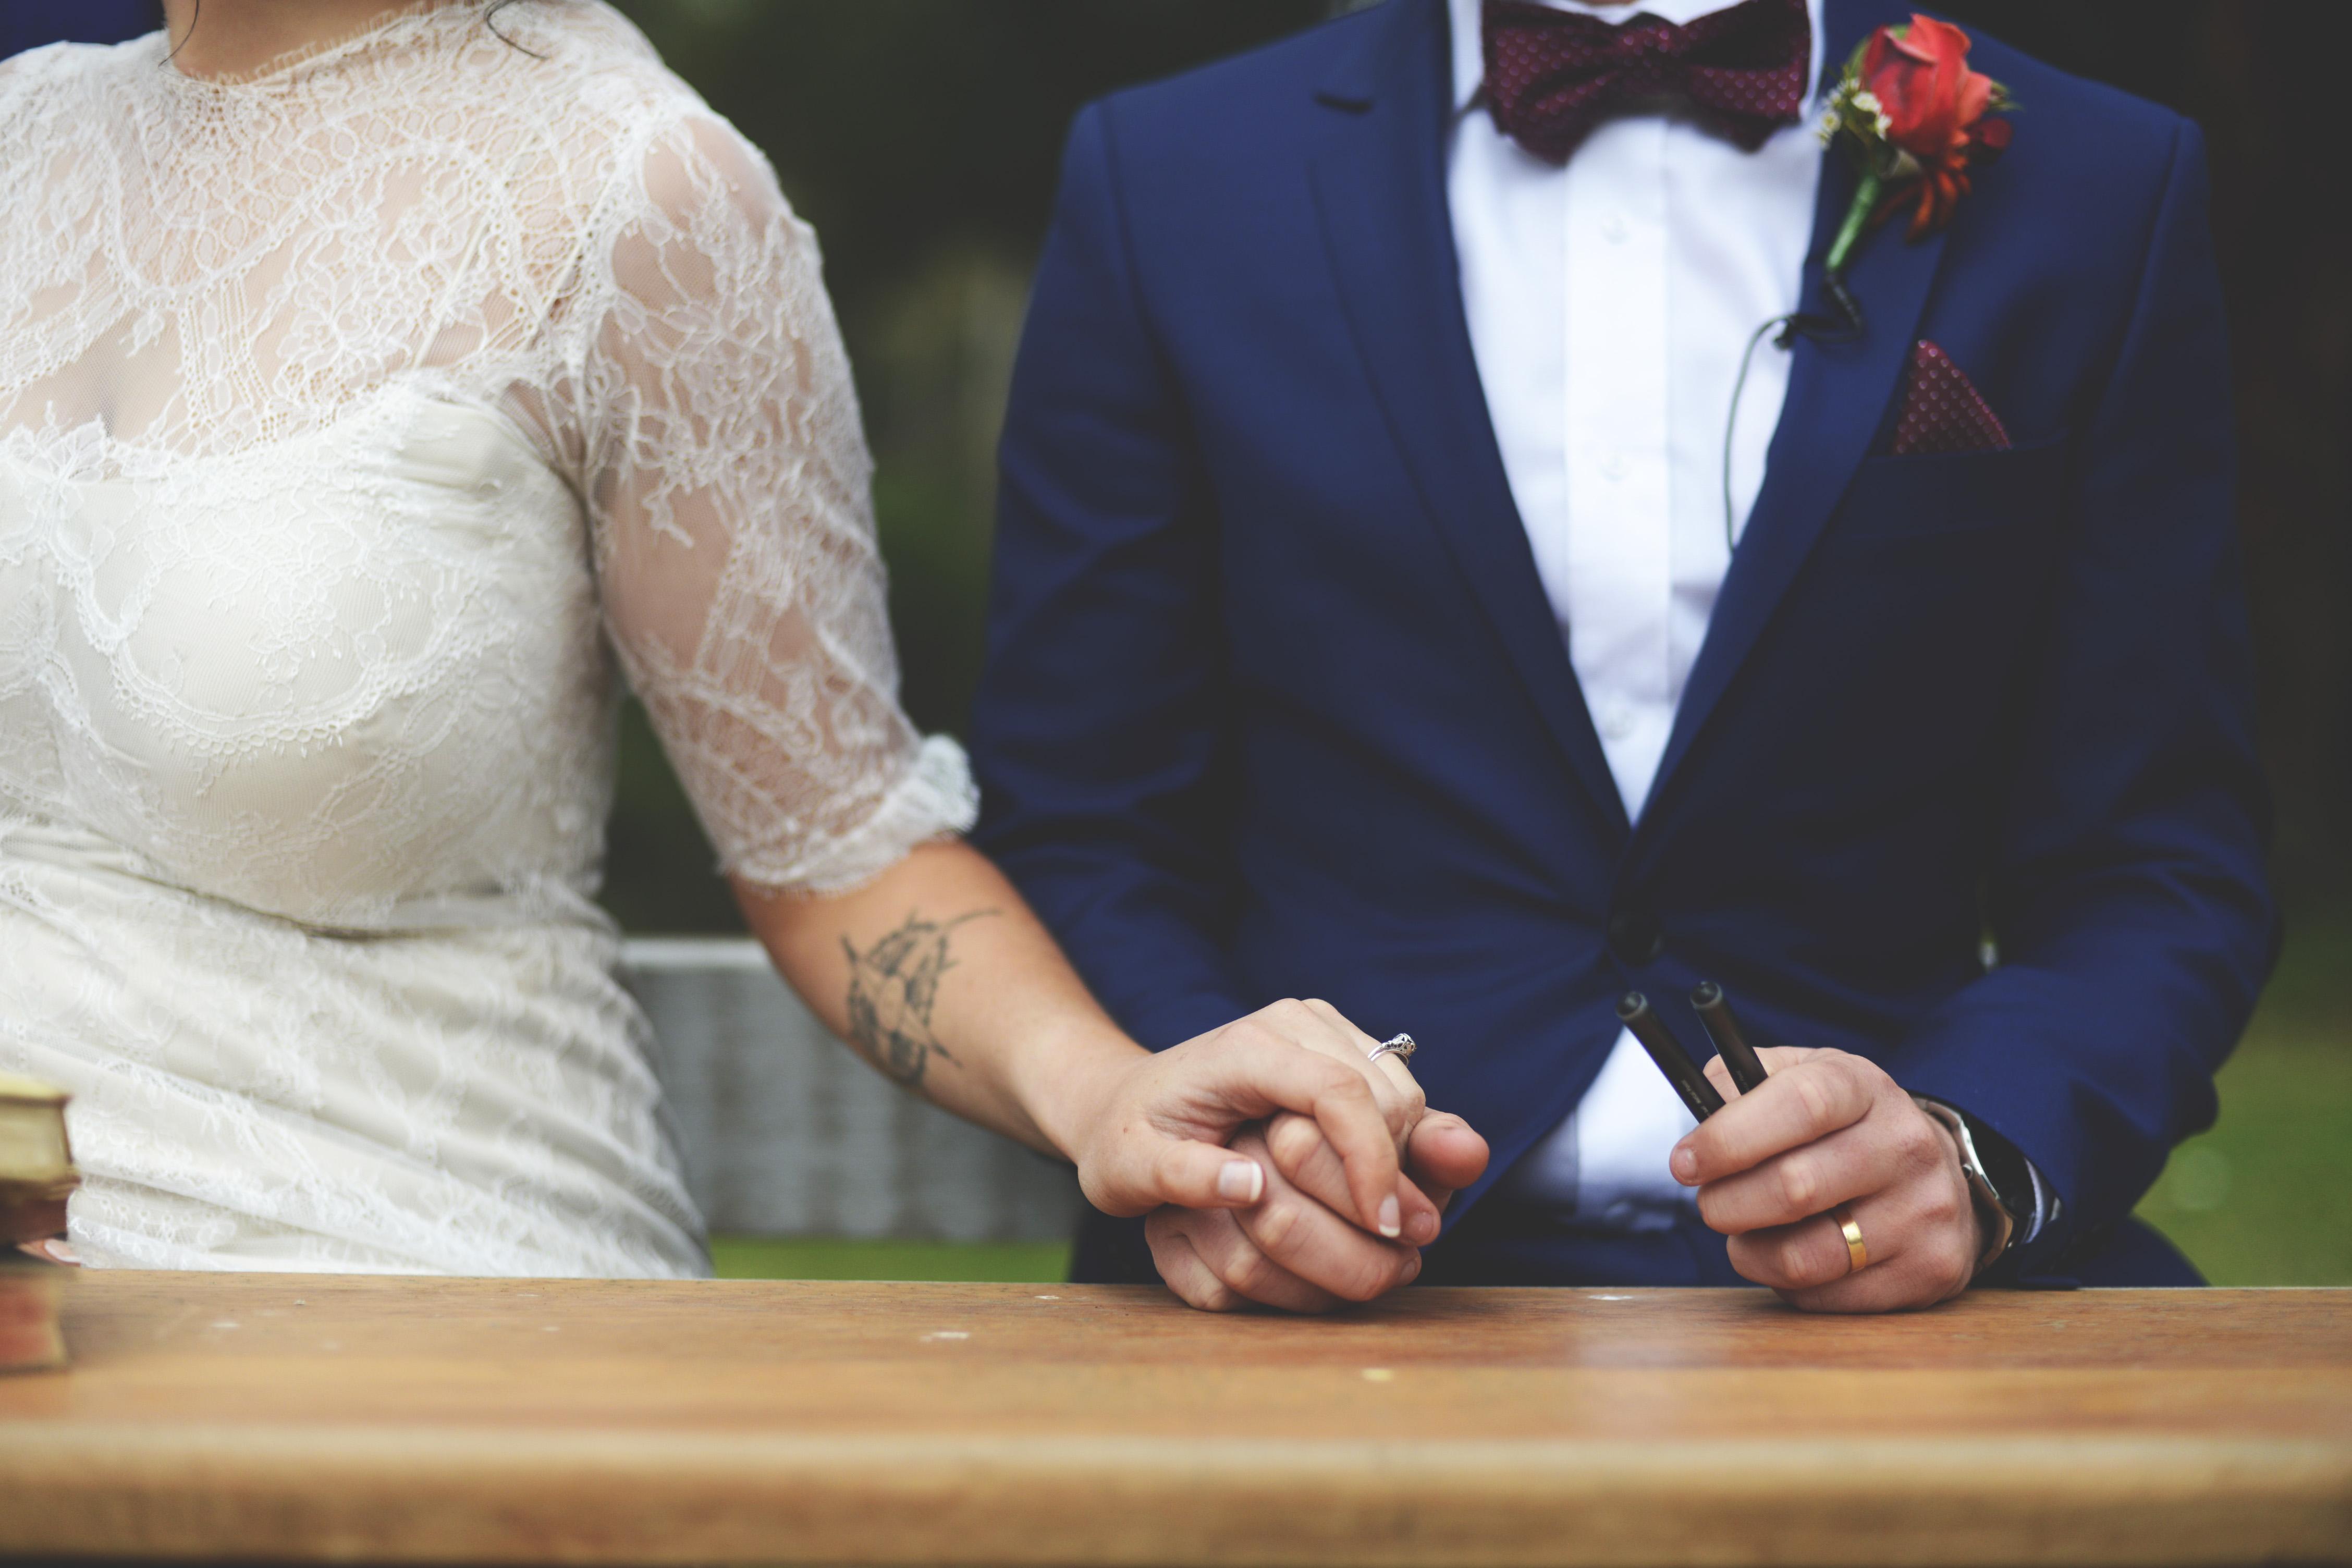 отлично брачный контракт фото югославии болгарии